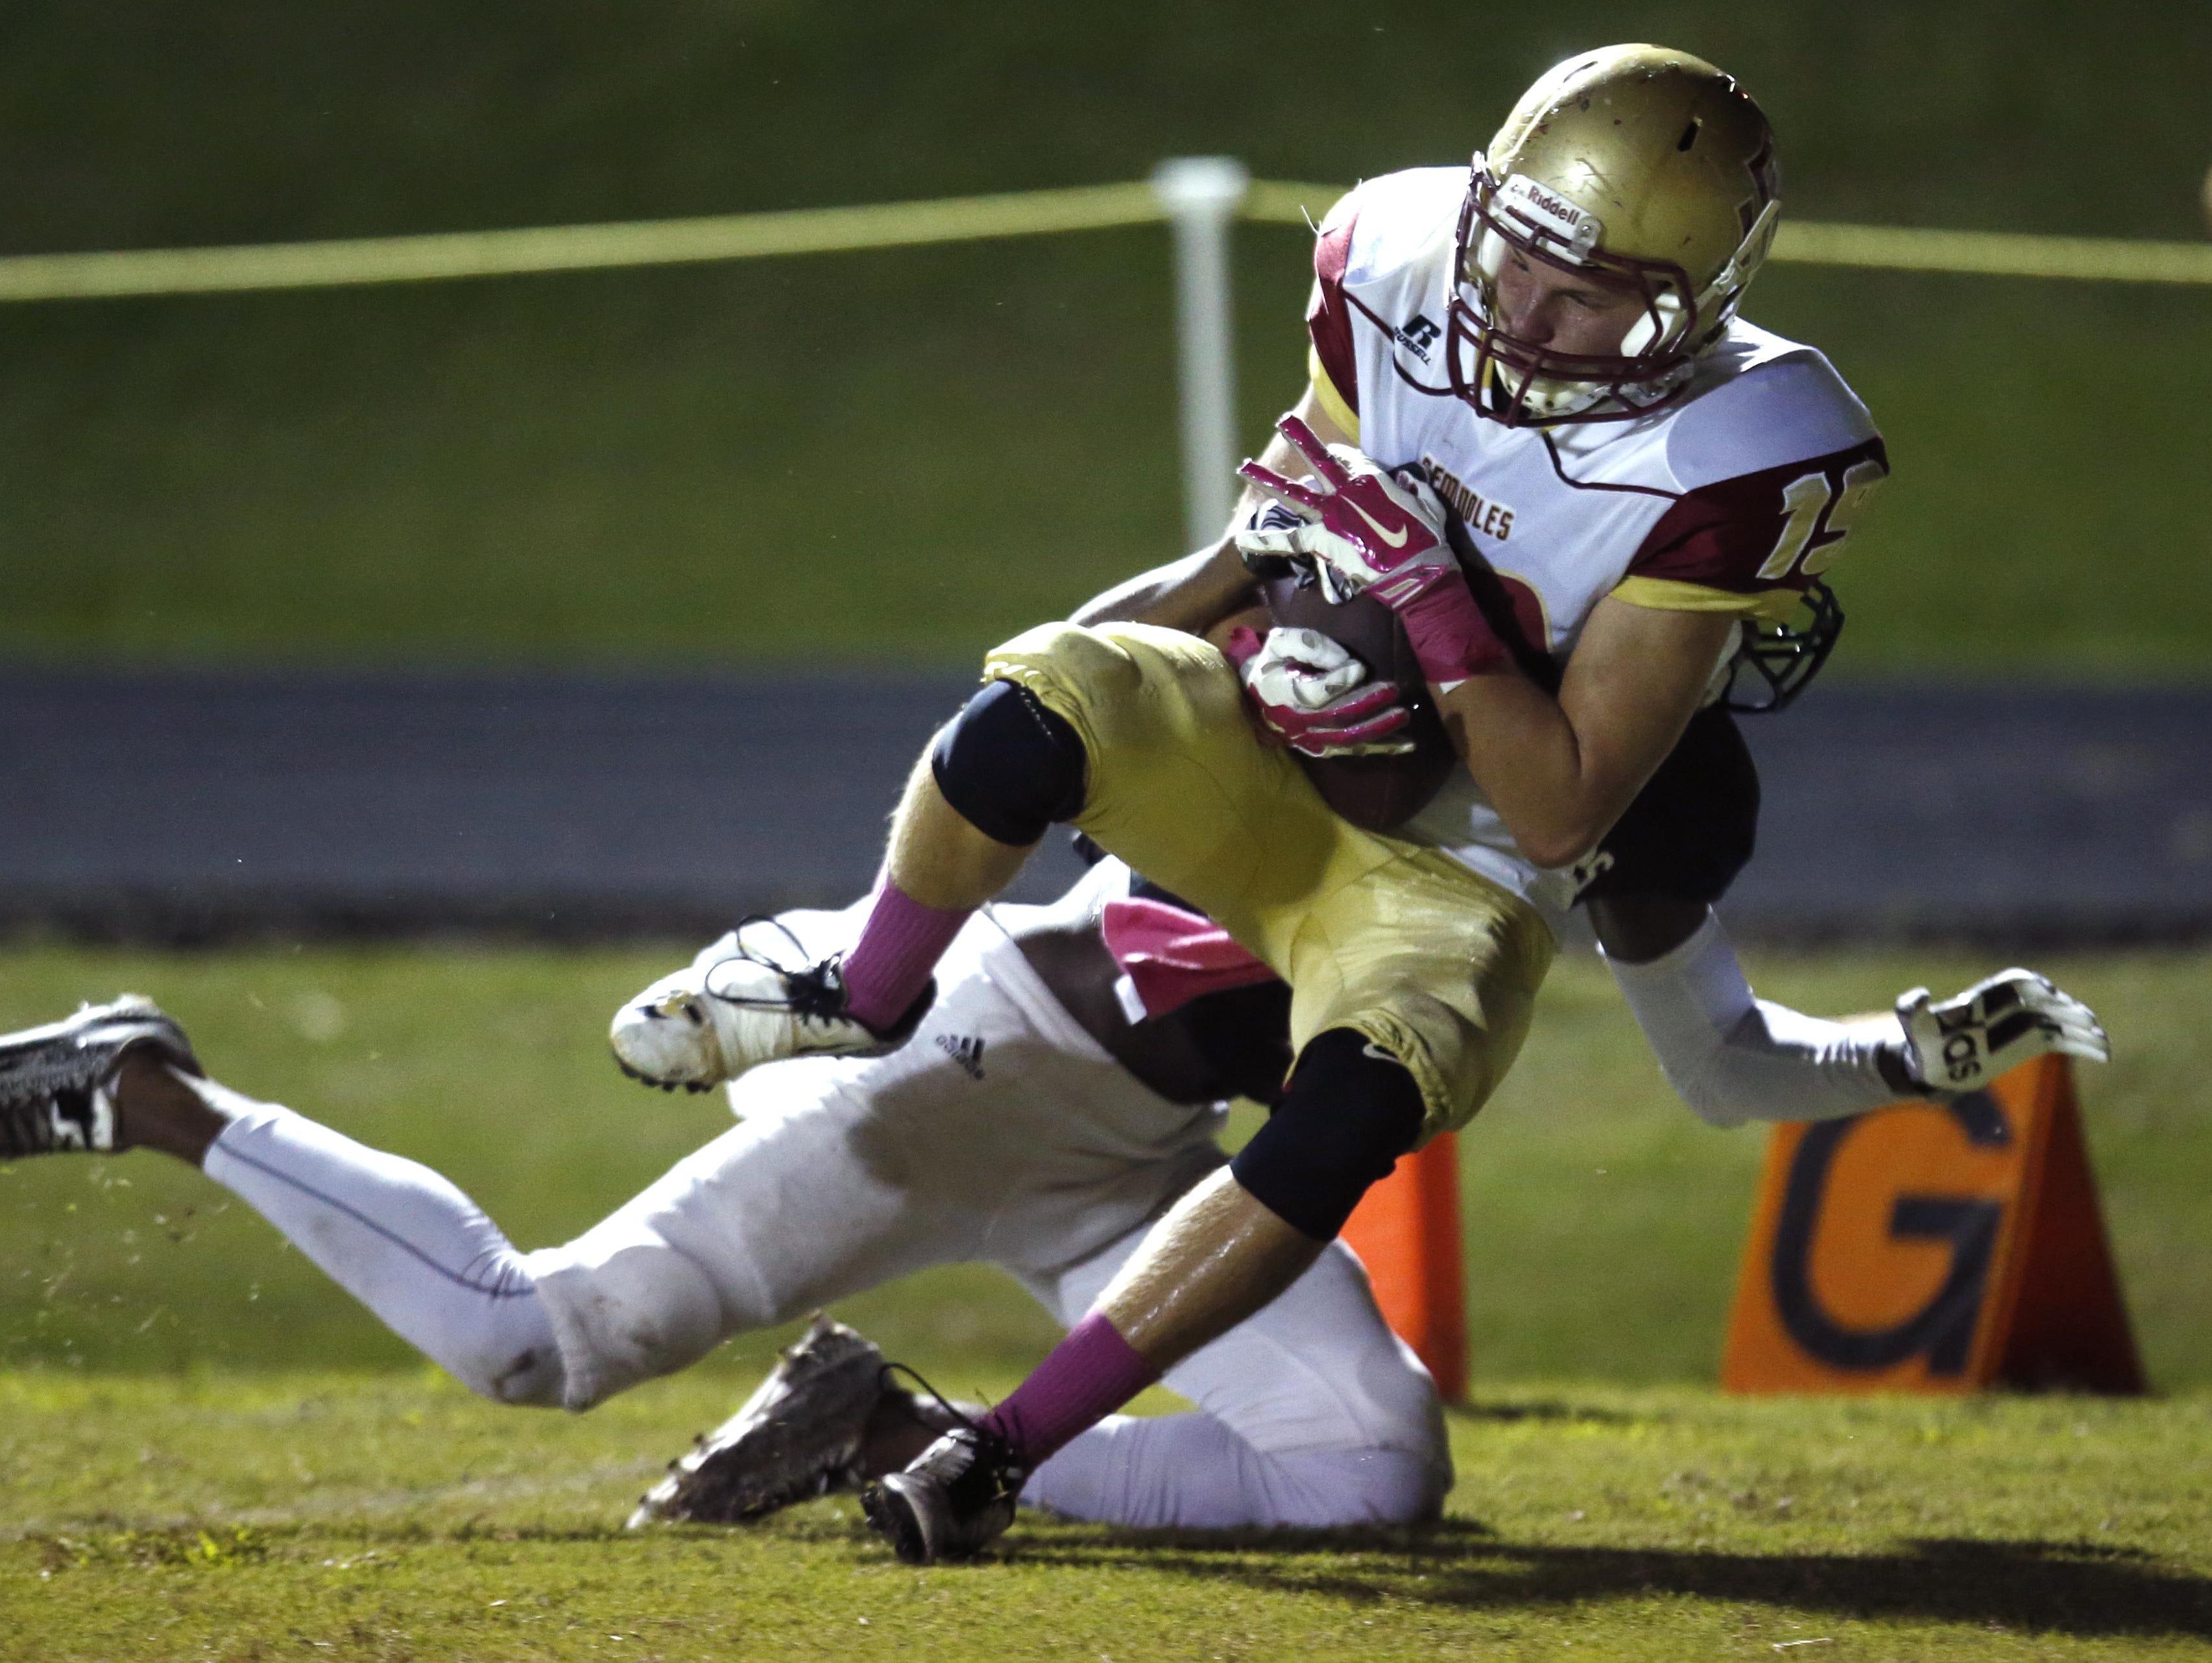 Florida High's Christian McGowan catches a touchdown pass against NFC on Friday.